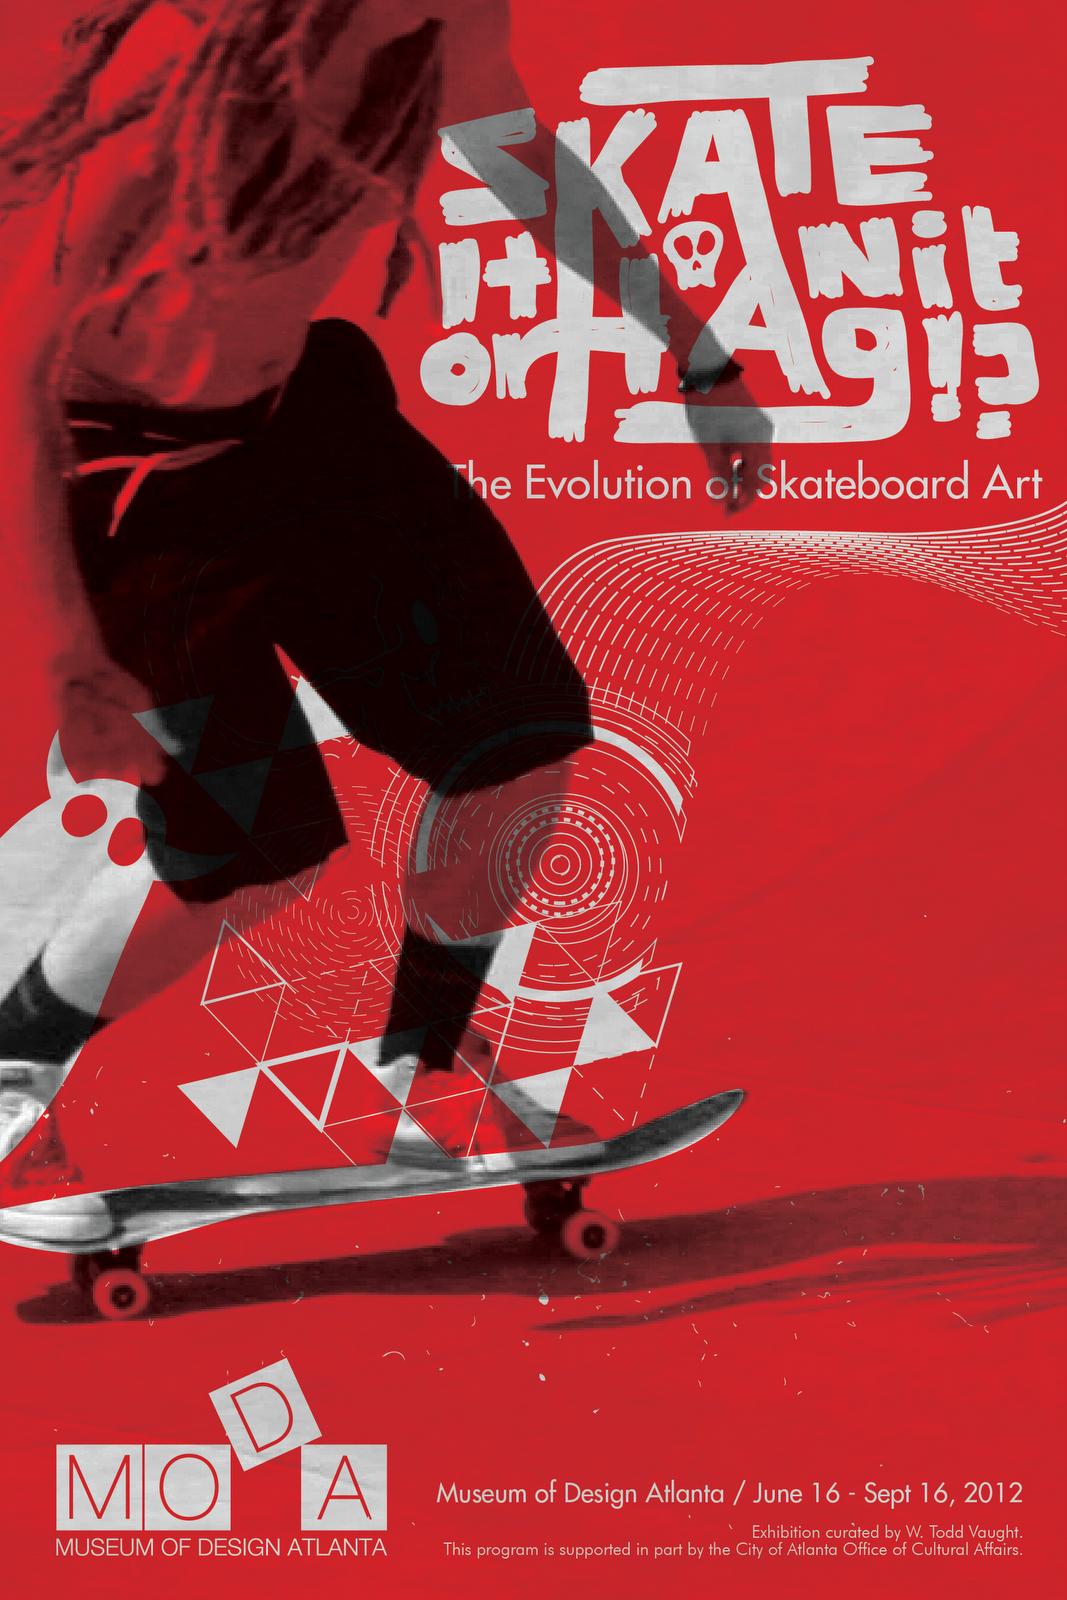 debush.: sweet paint ad + skate posters